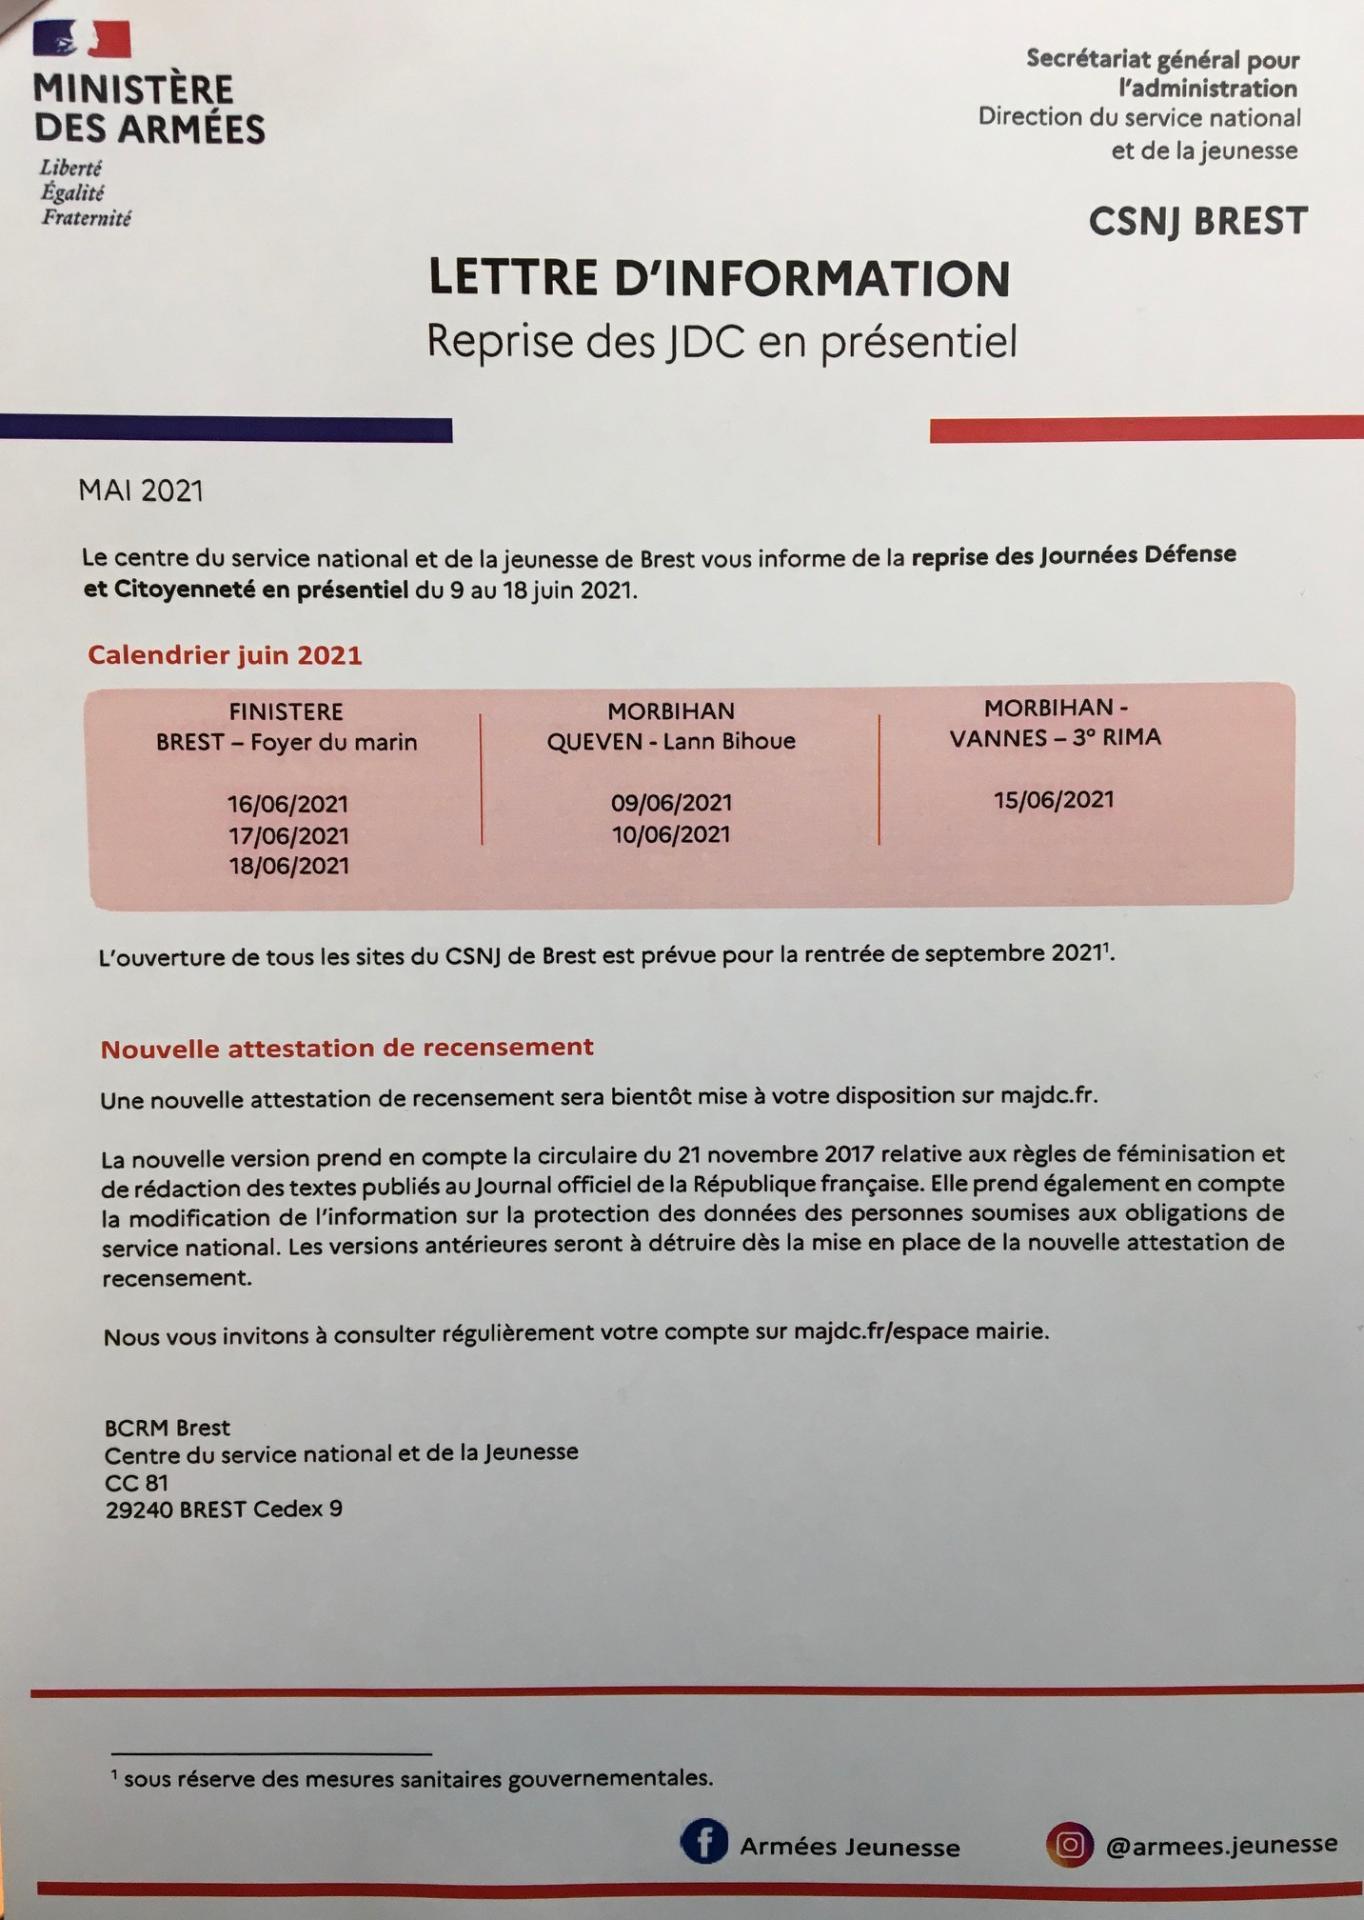 Ministere des armees mai 2021